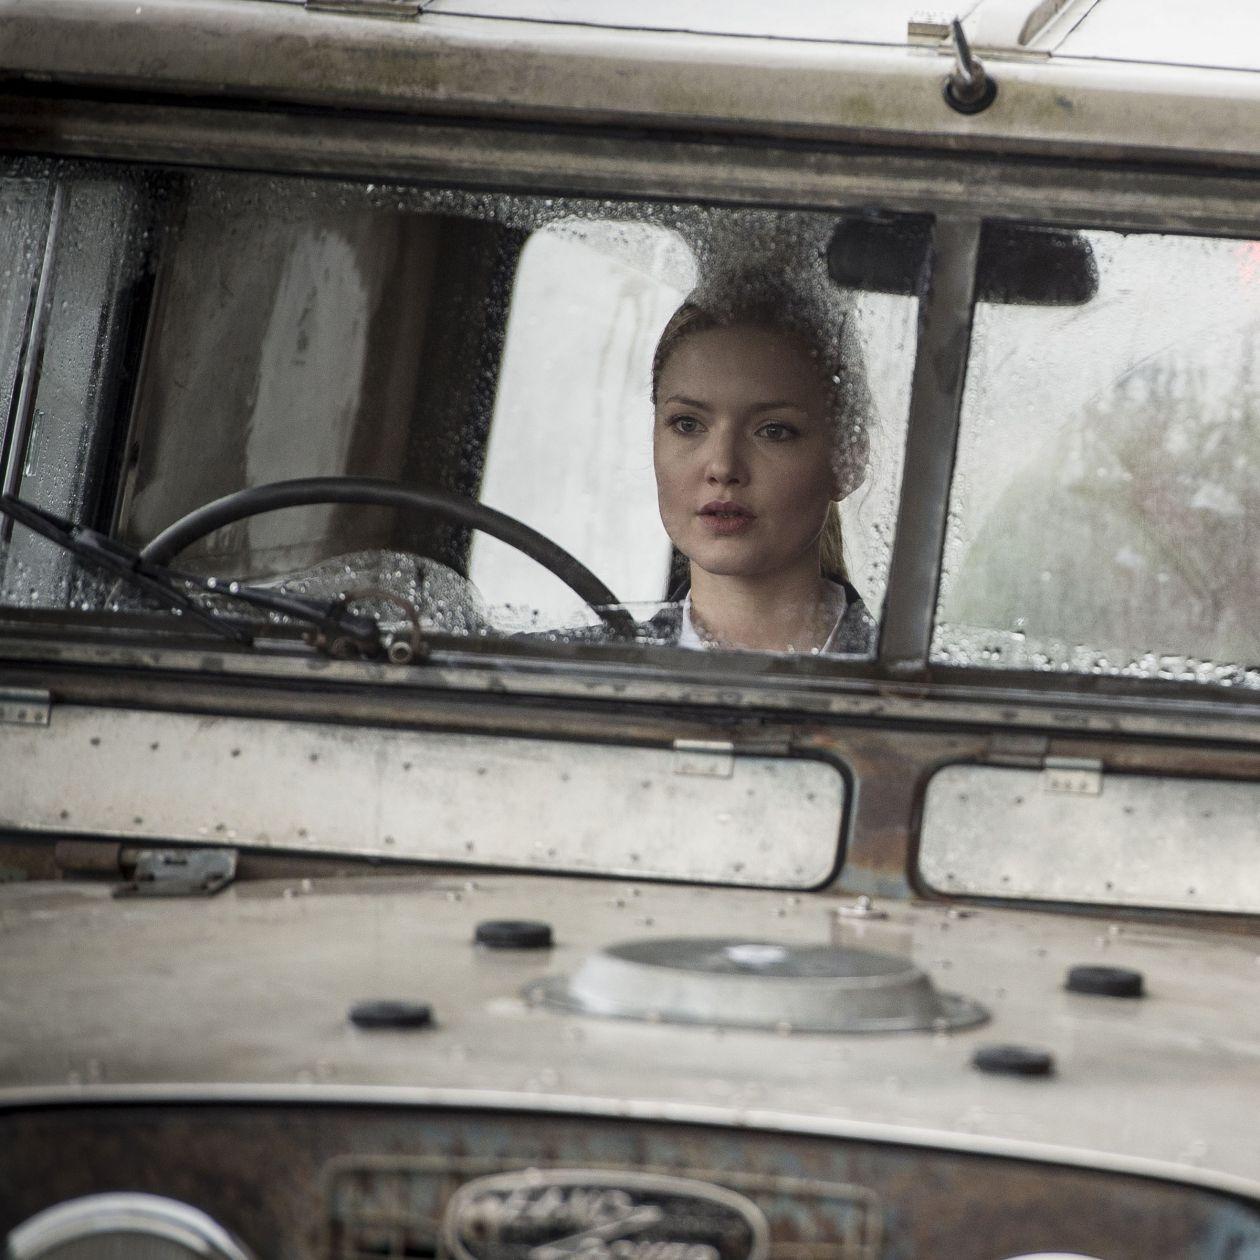 Holliday Grainger actress / Robin Ellacott / C.B. Strike